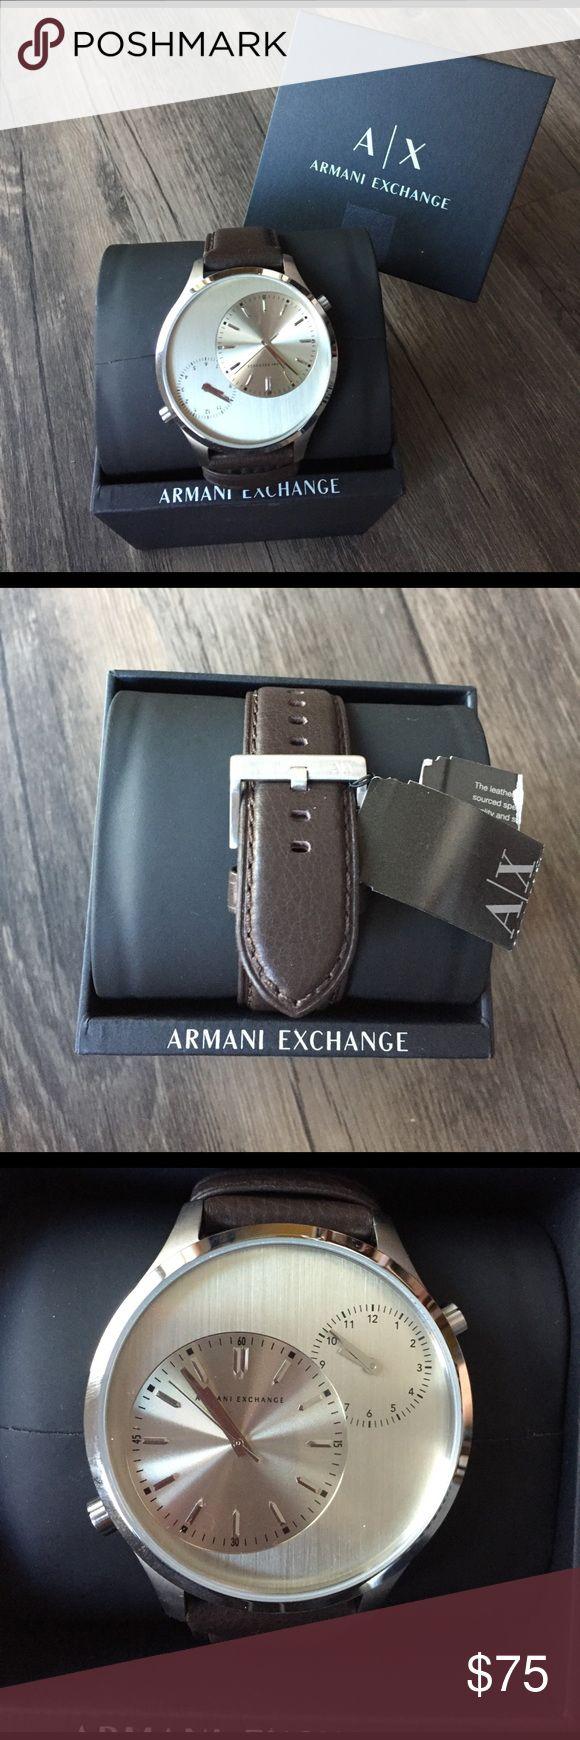 Selling this Armani Exchange Watch on Poshmark! My username is: jredlich4. #shopmycloset #poshmark #fashion #shopping #style #forsale #A/X Armani Exchange #Other